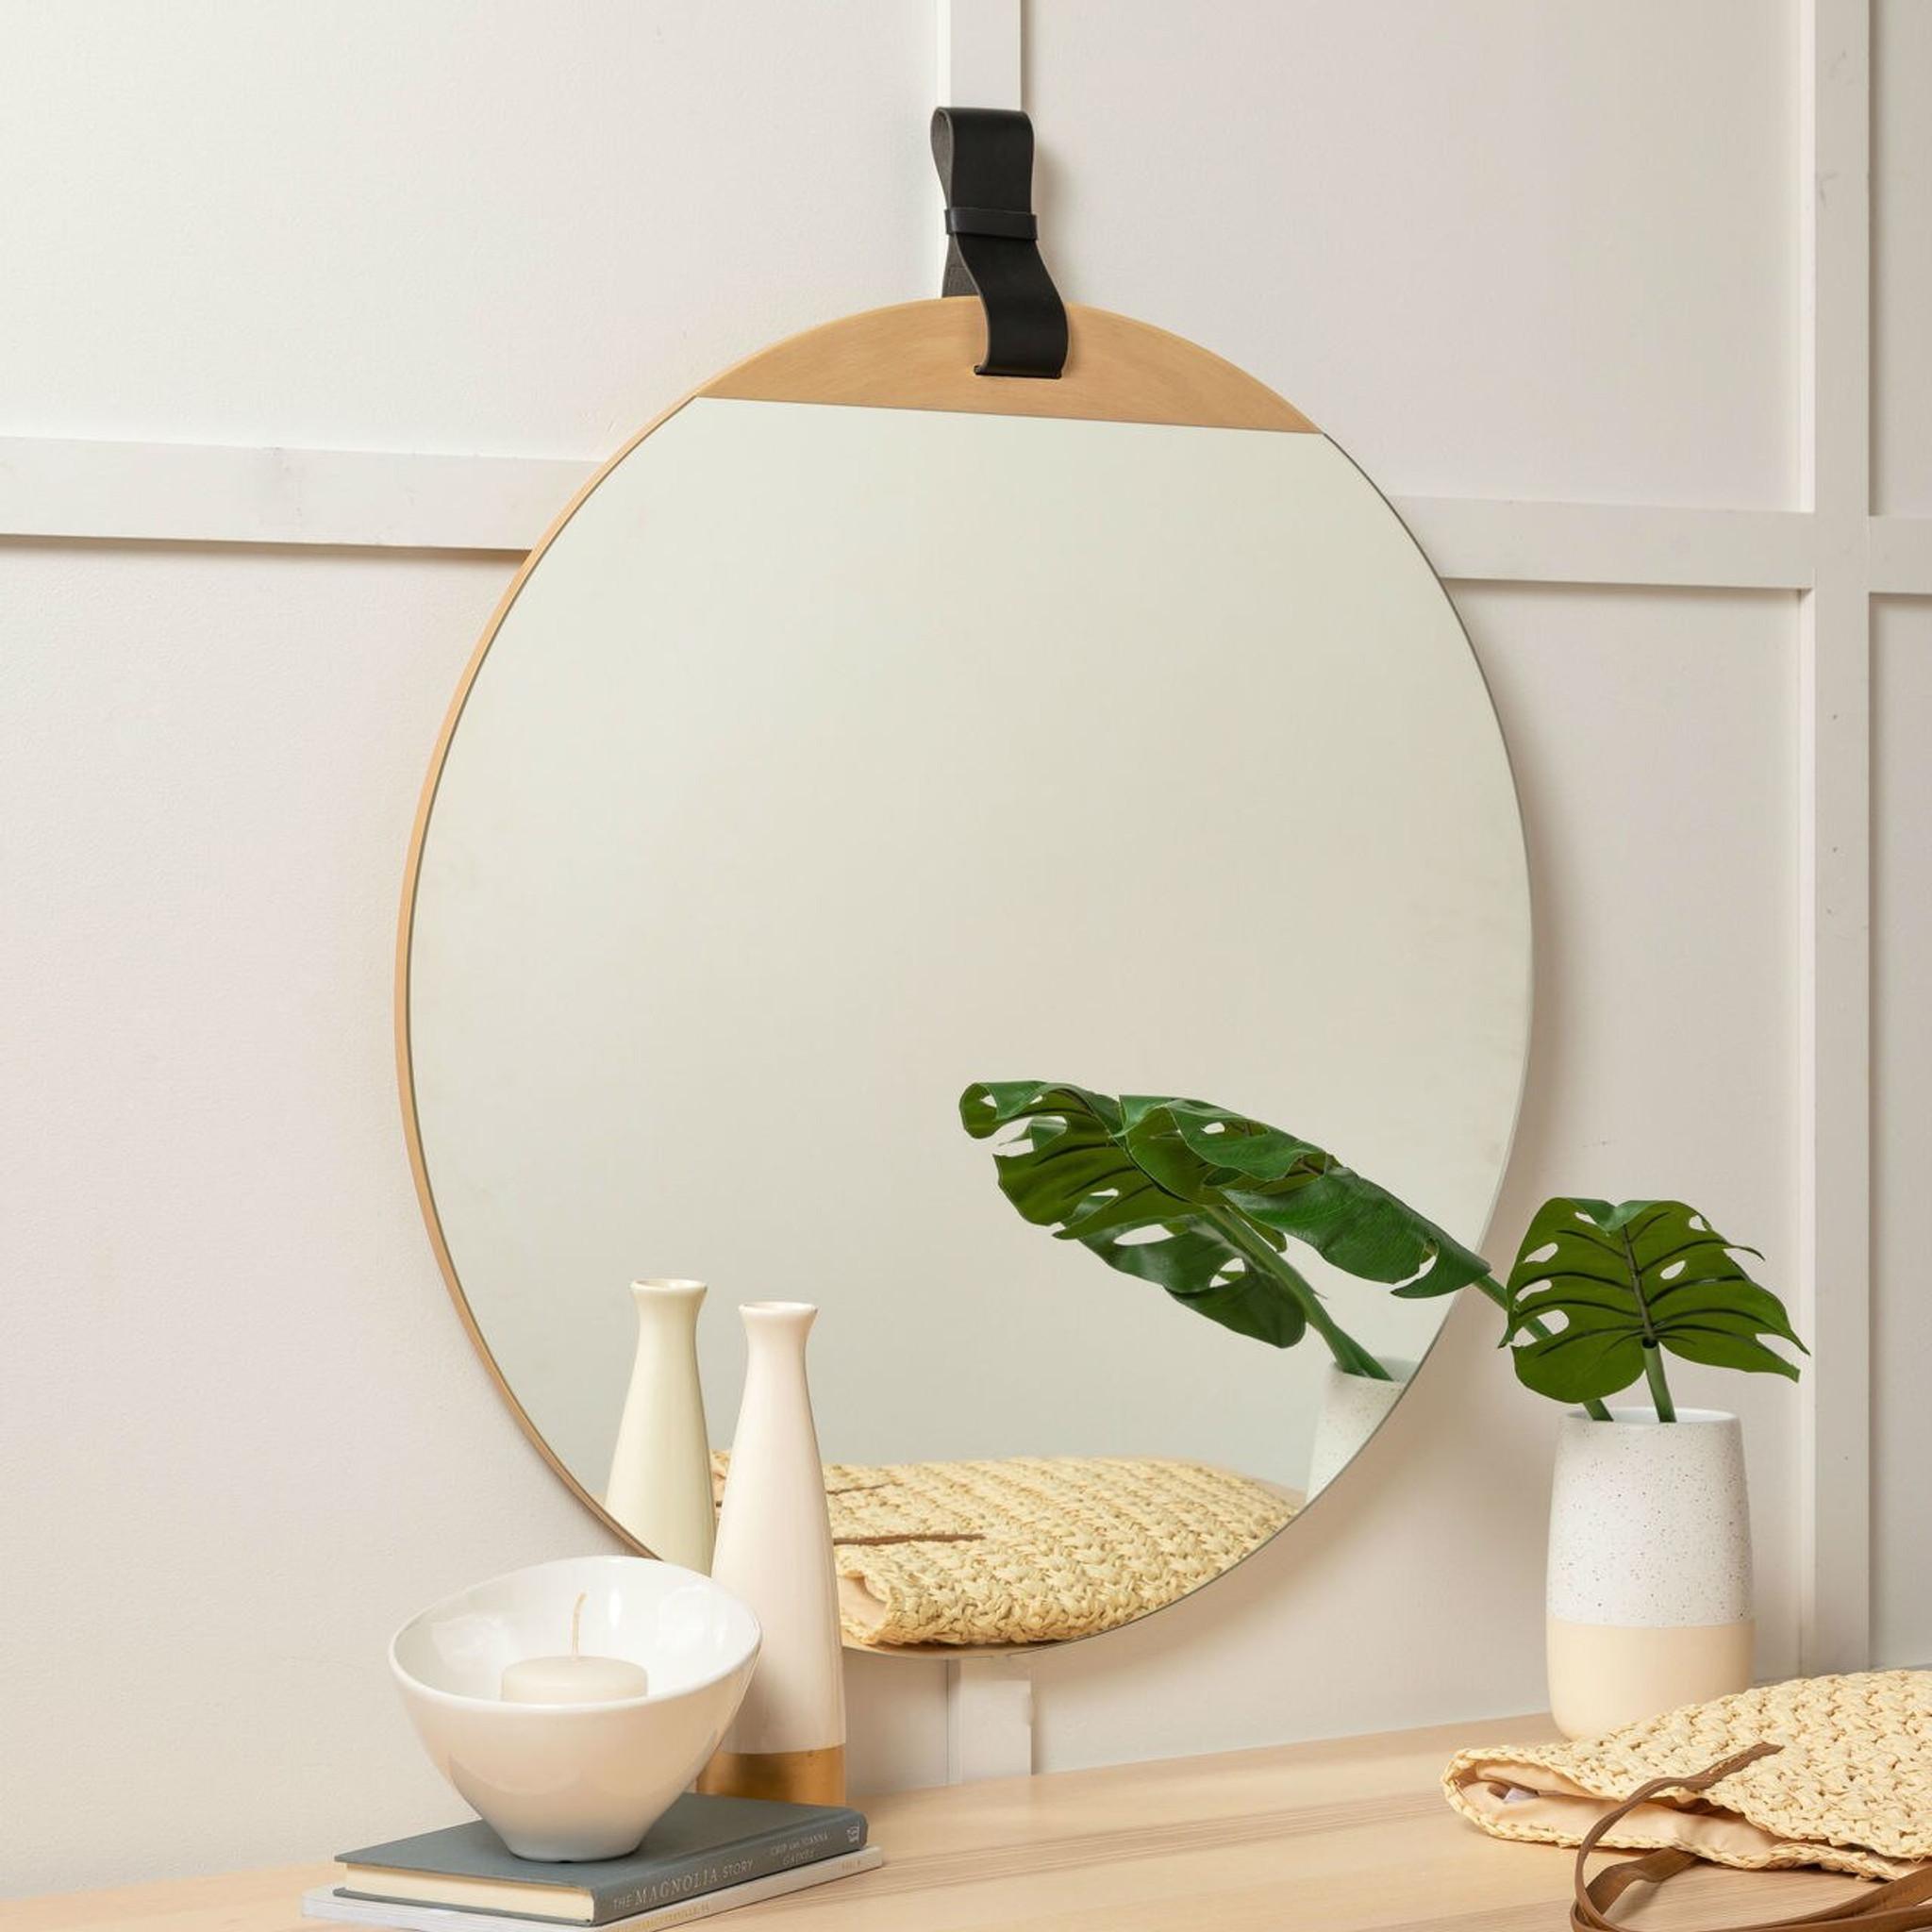 round mirror leather strap modern frameless powder room bathroom Heppner Wall Mirror